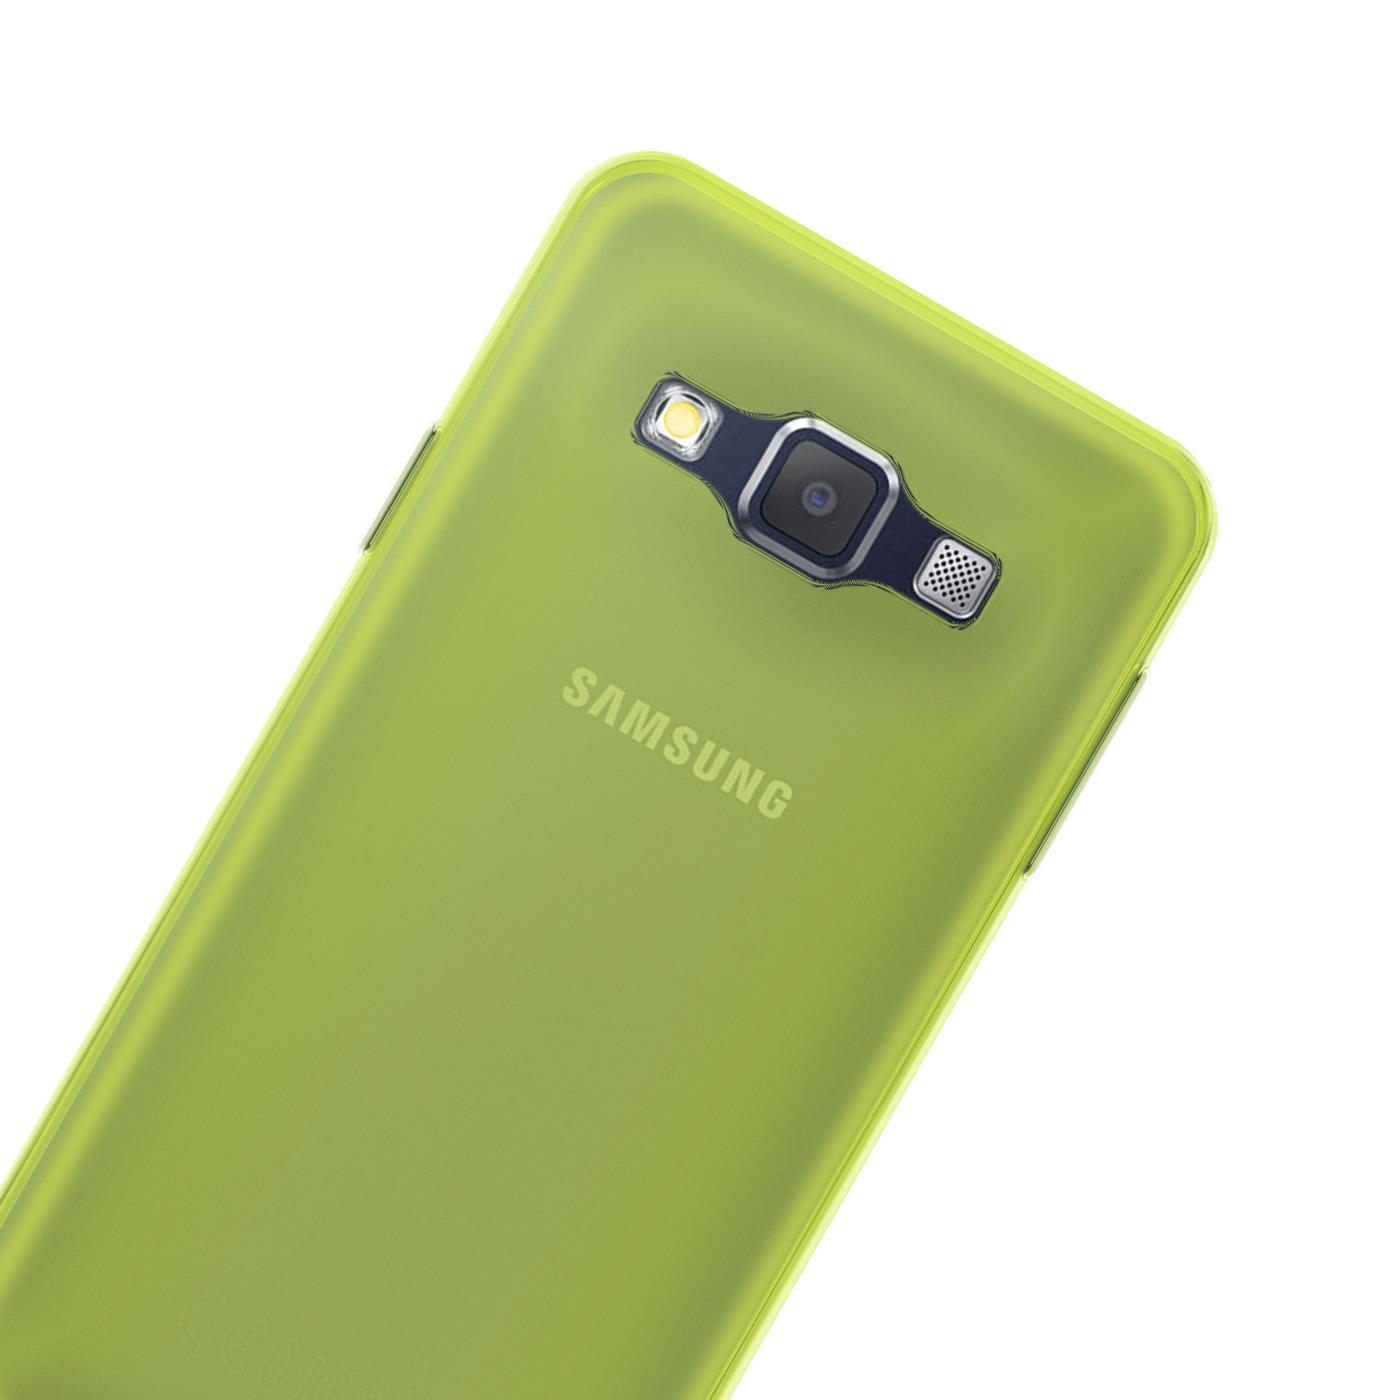 Samsung-Galaxy-A3-2015-Thin-Silicone-Clear-Case-Cover-Ultra-Slim-Shockproof-Gel Indexbild 12